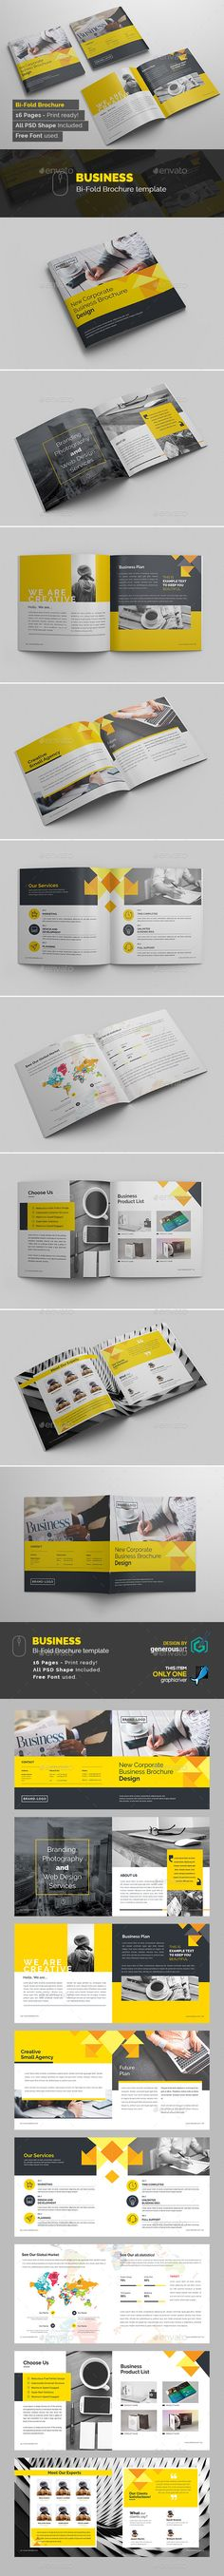 BiFold Brochure — Photoshop PSD #blue #8x8 • Download ➝ https://graphicriver.net/item/bifold-brochure/19118151?ref=pxcr